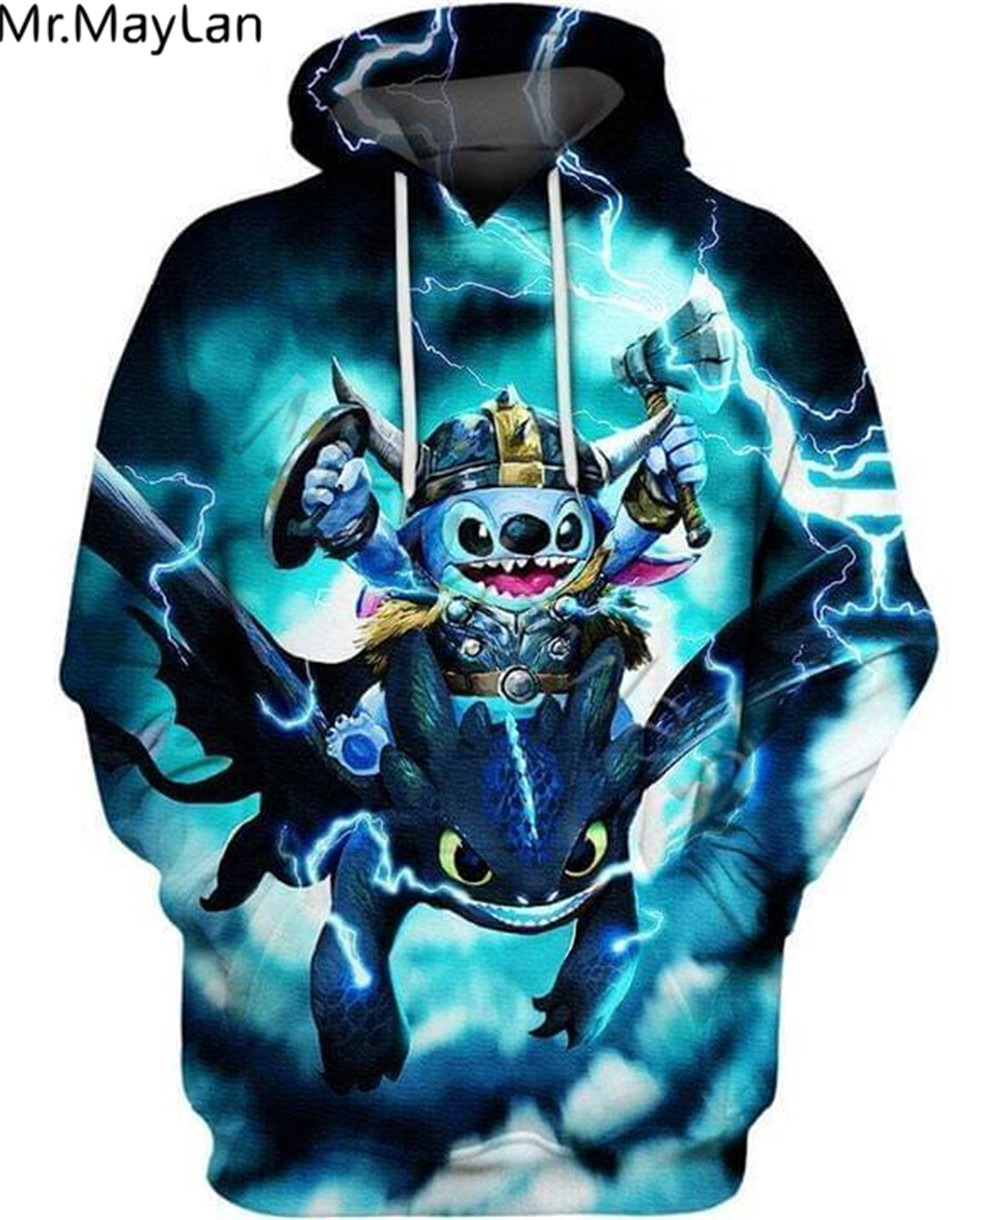 Cool Viking Stitch And Toothless Printed 3D Jacket Men's Anime Hoodies Men/Women Unisex Sweatshirt Boys Blue Streetwear Outfits